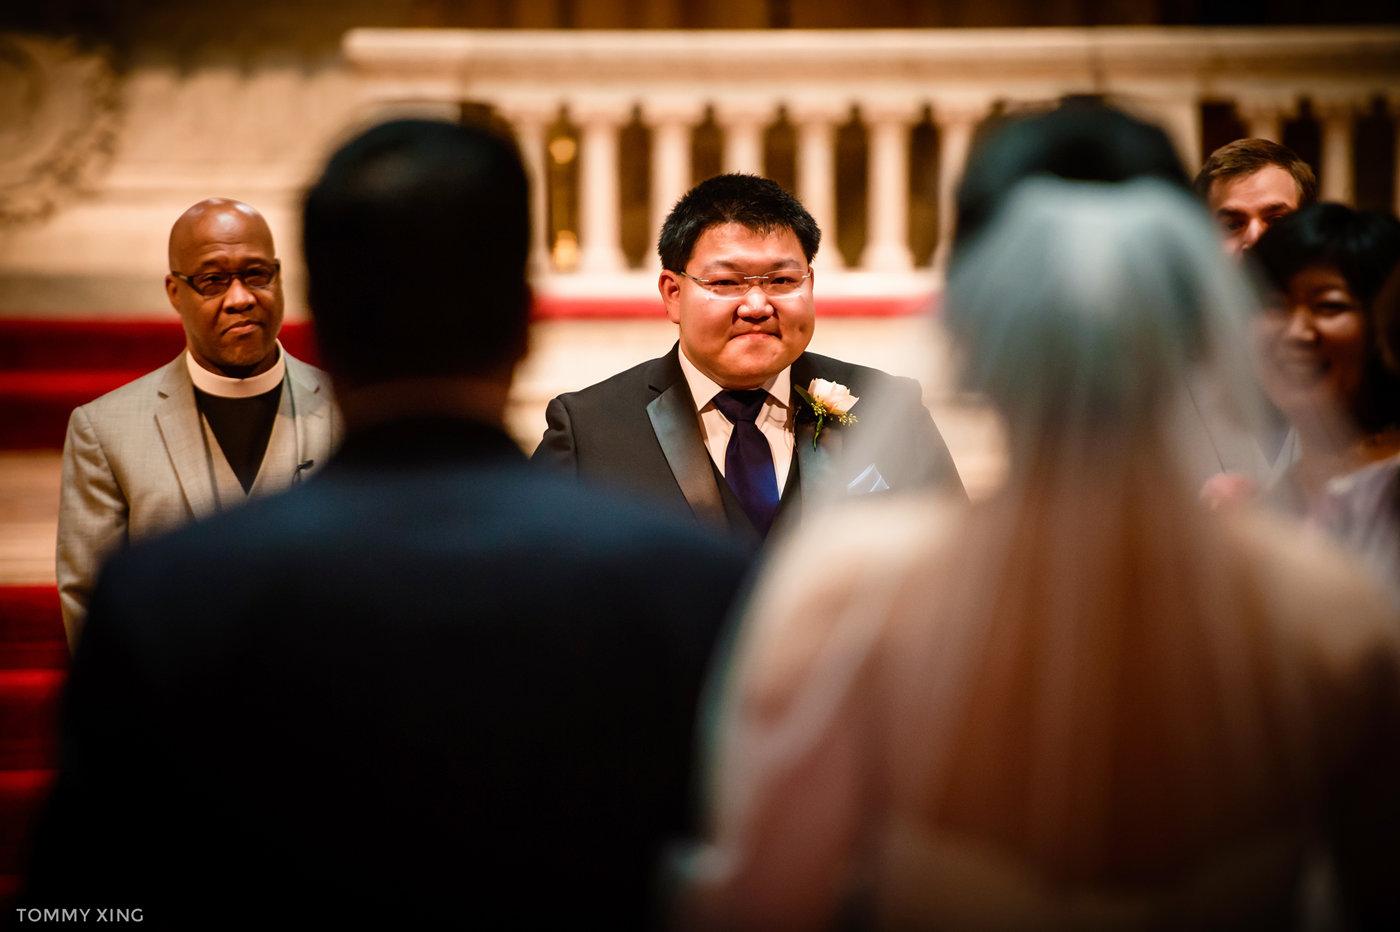 STANFORD MEMORIAL CHURCH WEDDING - Wenjie & Chengcheng - SAN FRANCISCO BAY AREA 斯坦福教堂婚礼跟拍 - 洛杉矶婚礼婚纱照摄影师 Tommy Xing Photography078.jpg